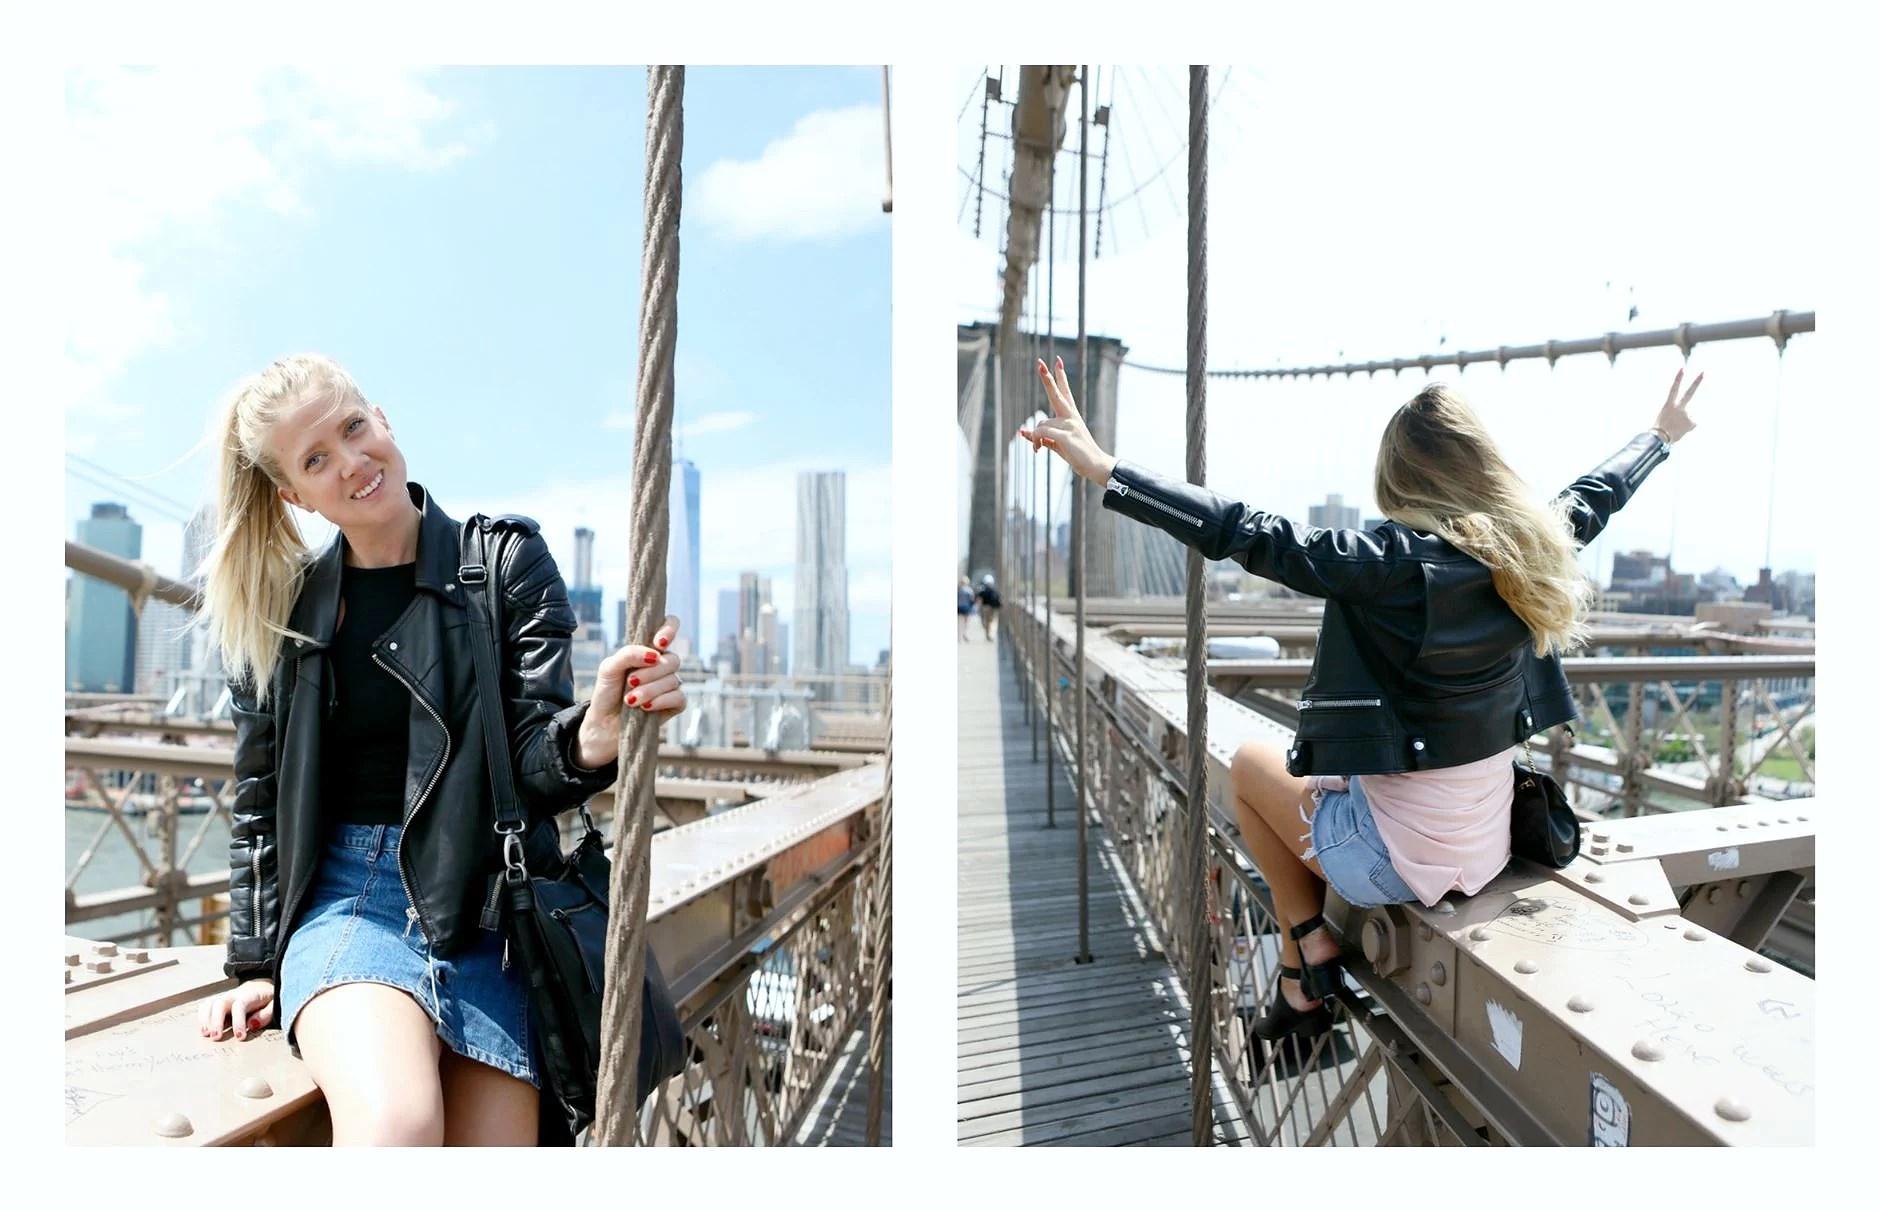 PicMonkey Collage (73) (2)